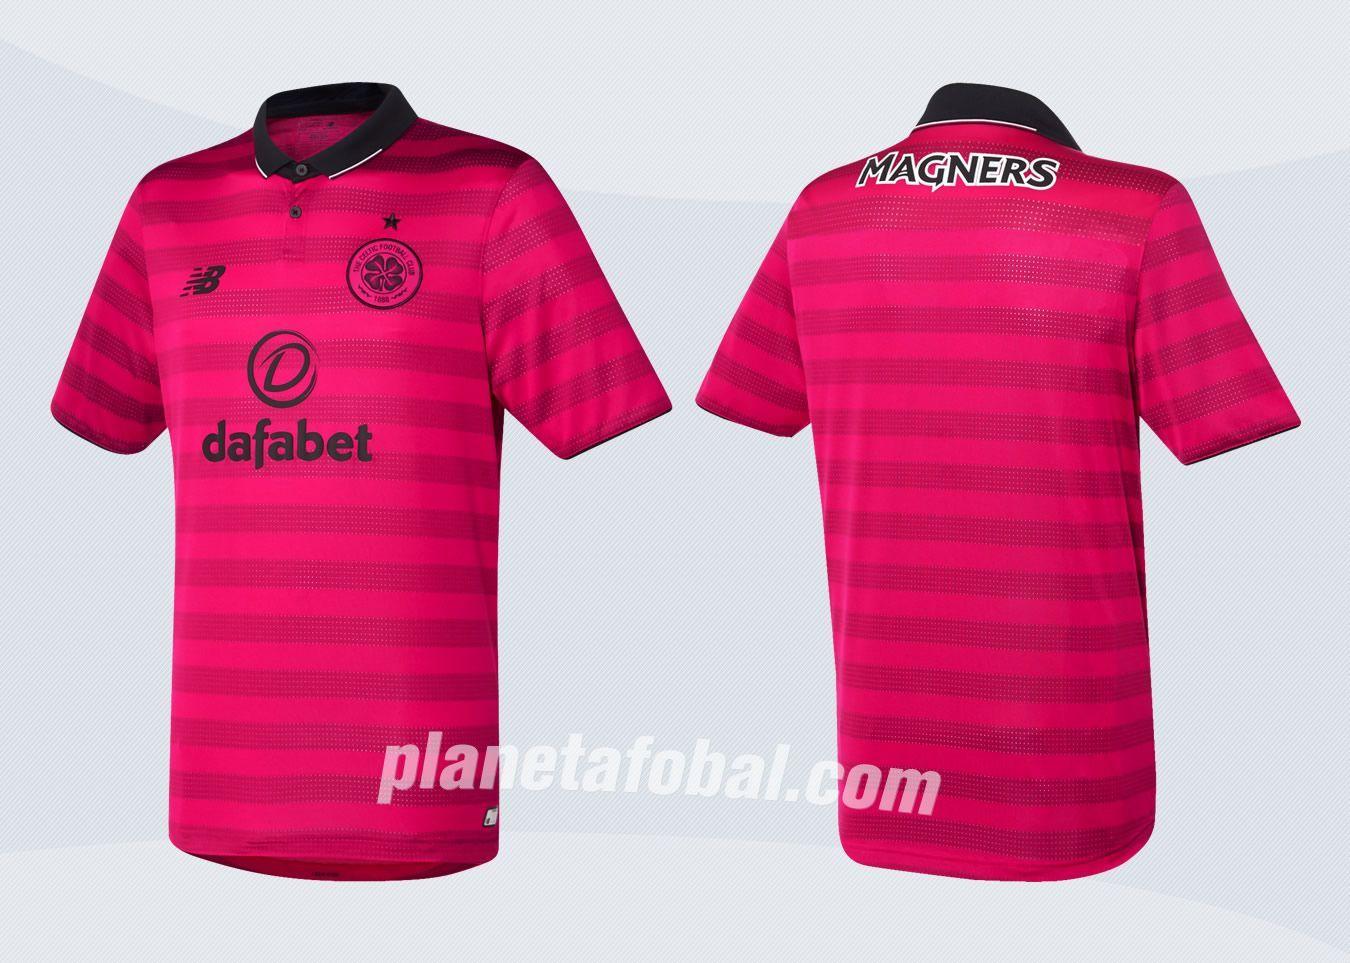 Tercera camiseta New Balance del Celtic Glasgow para 2016/2017 | Imágenes Tienda Oficial